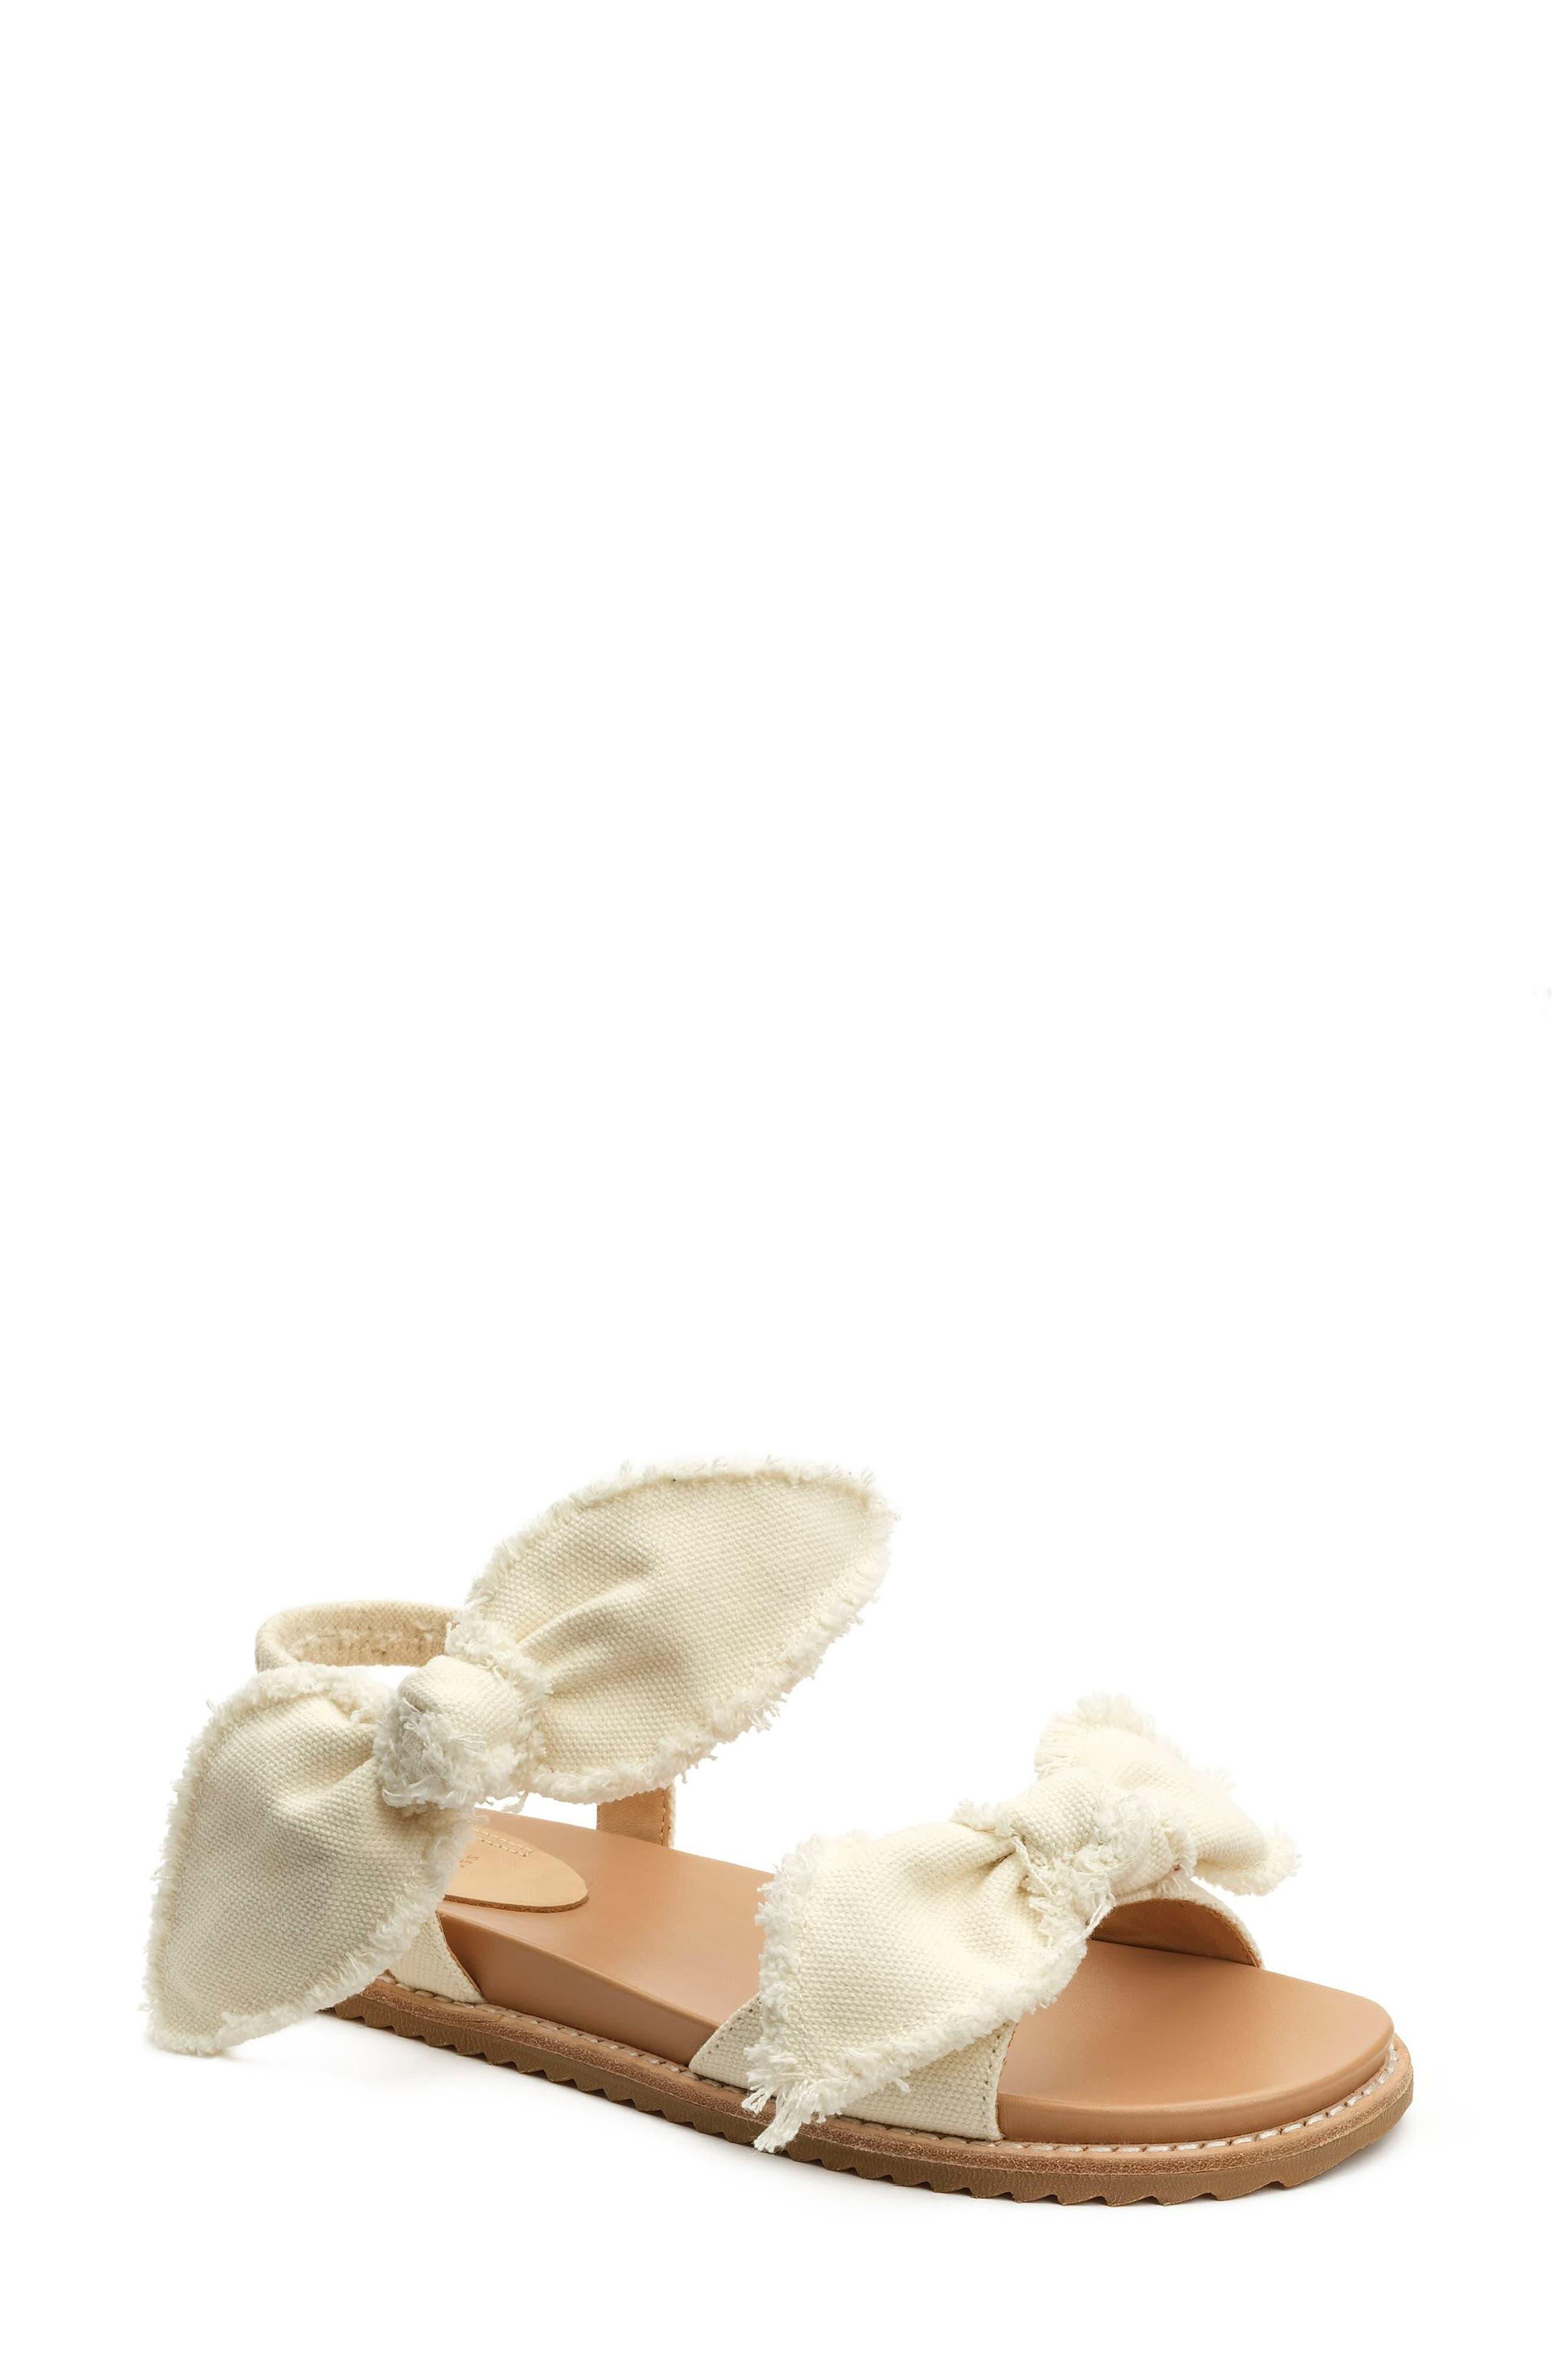 Camden Sandal,                         Main,                         color, Ivory